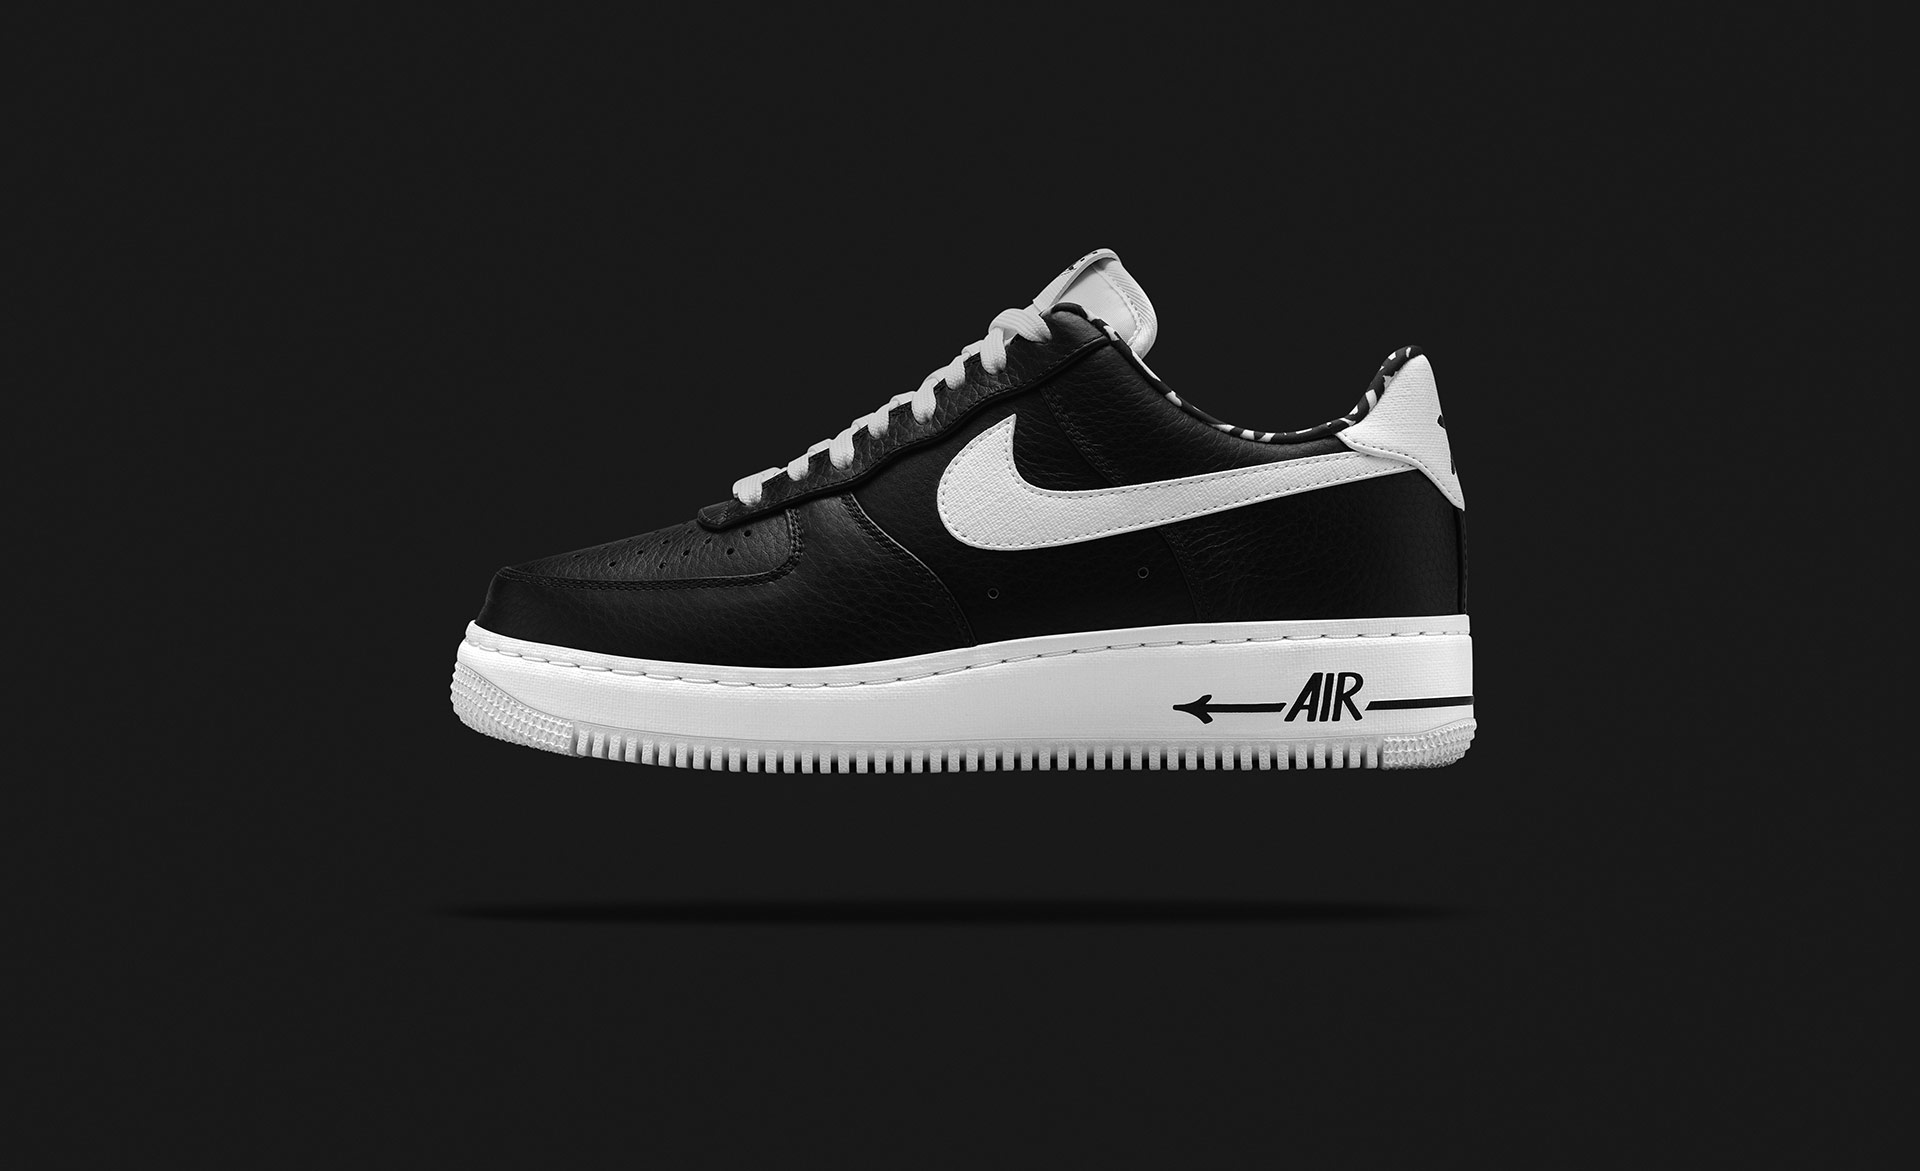 Eric Haze Nike Air Force 1 blackbooks